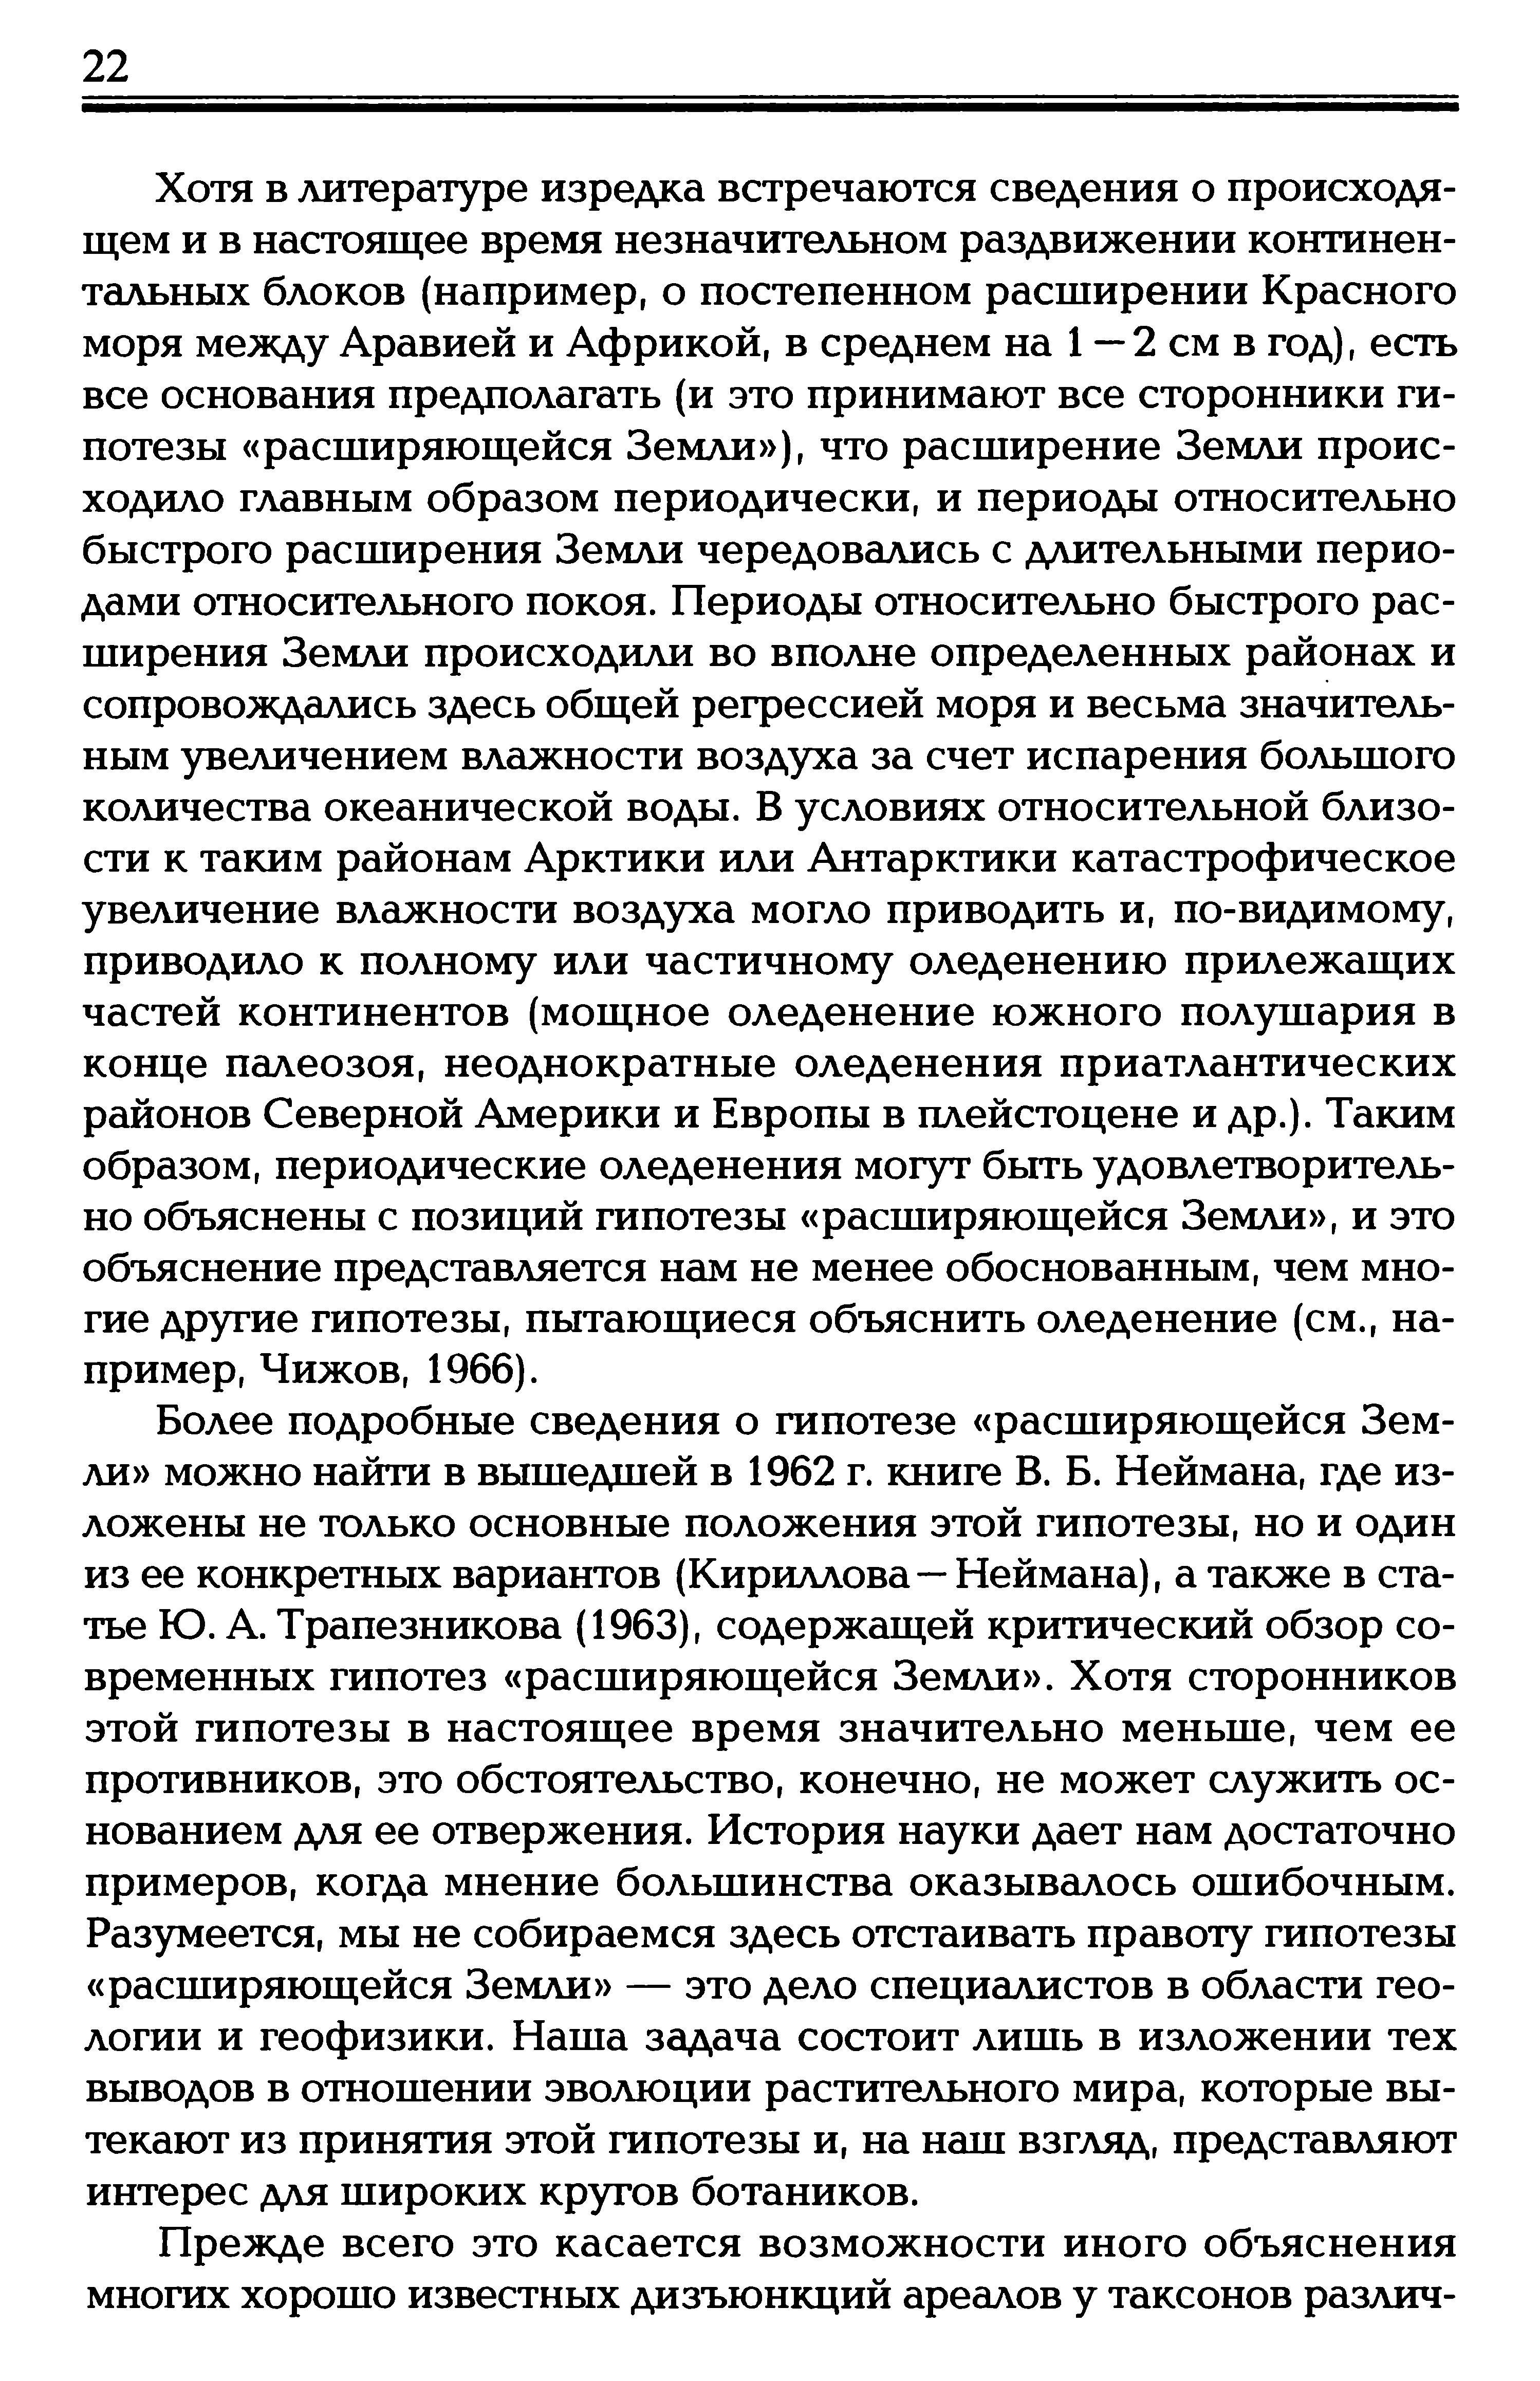 Tzvelev, 2005_1_03.jpeg